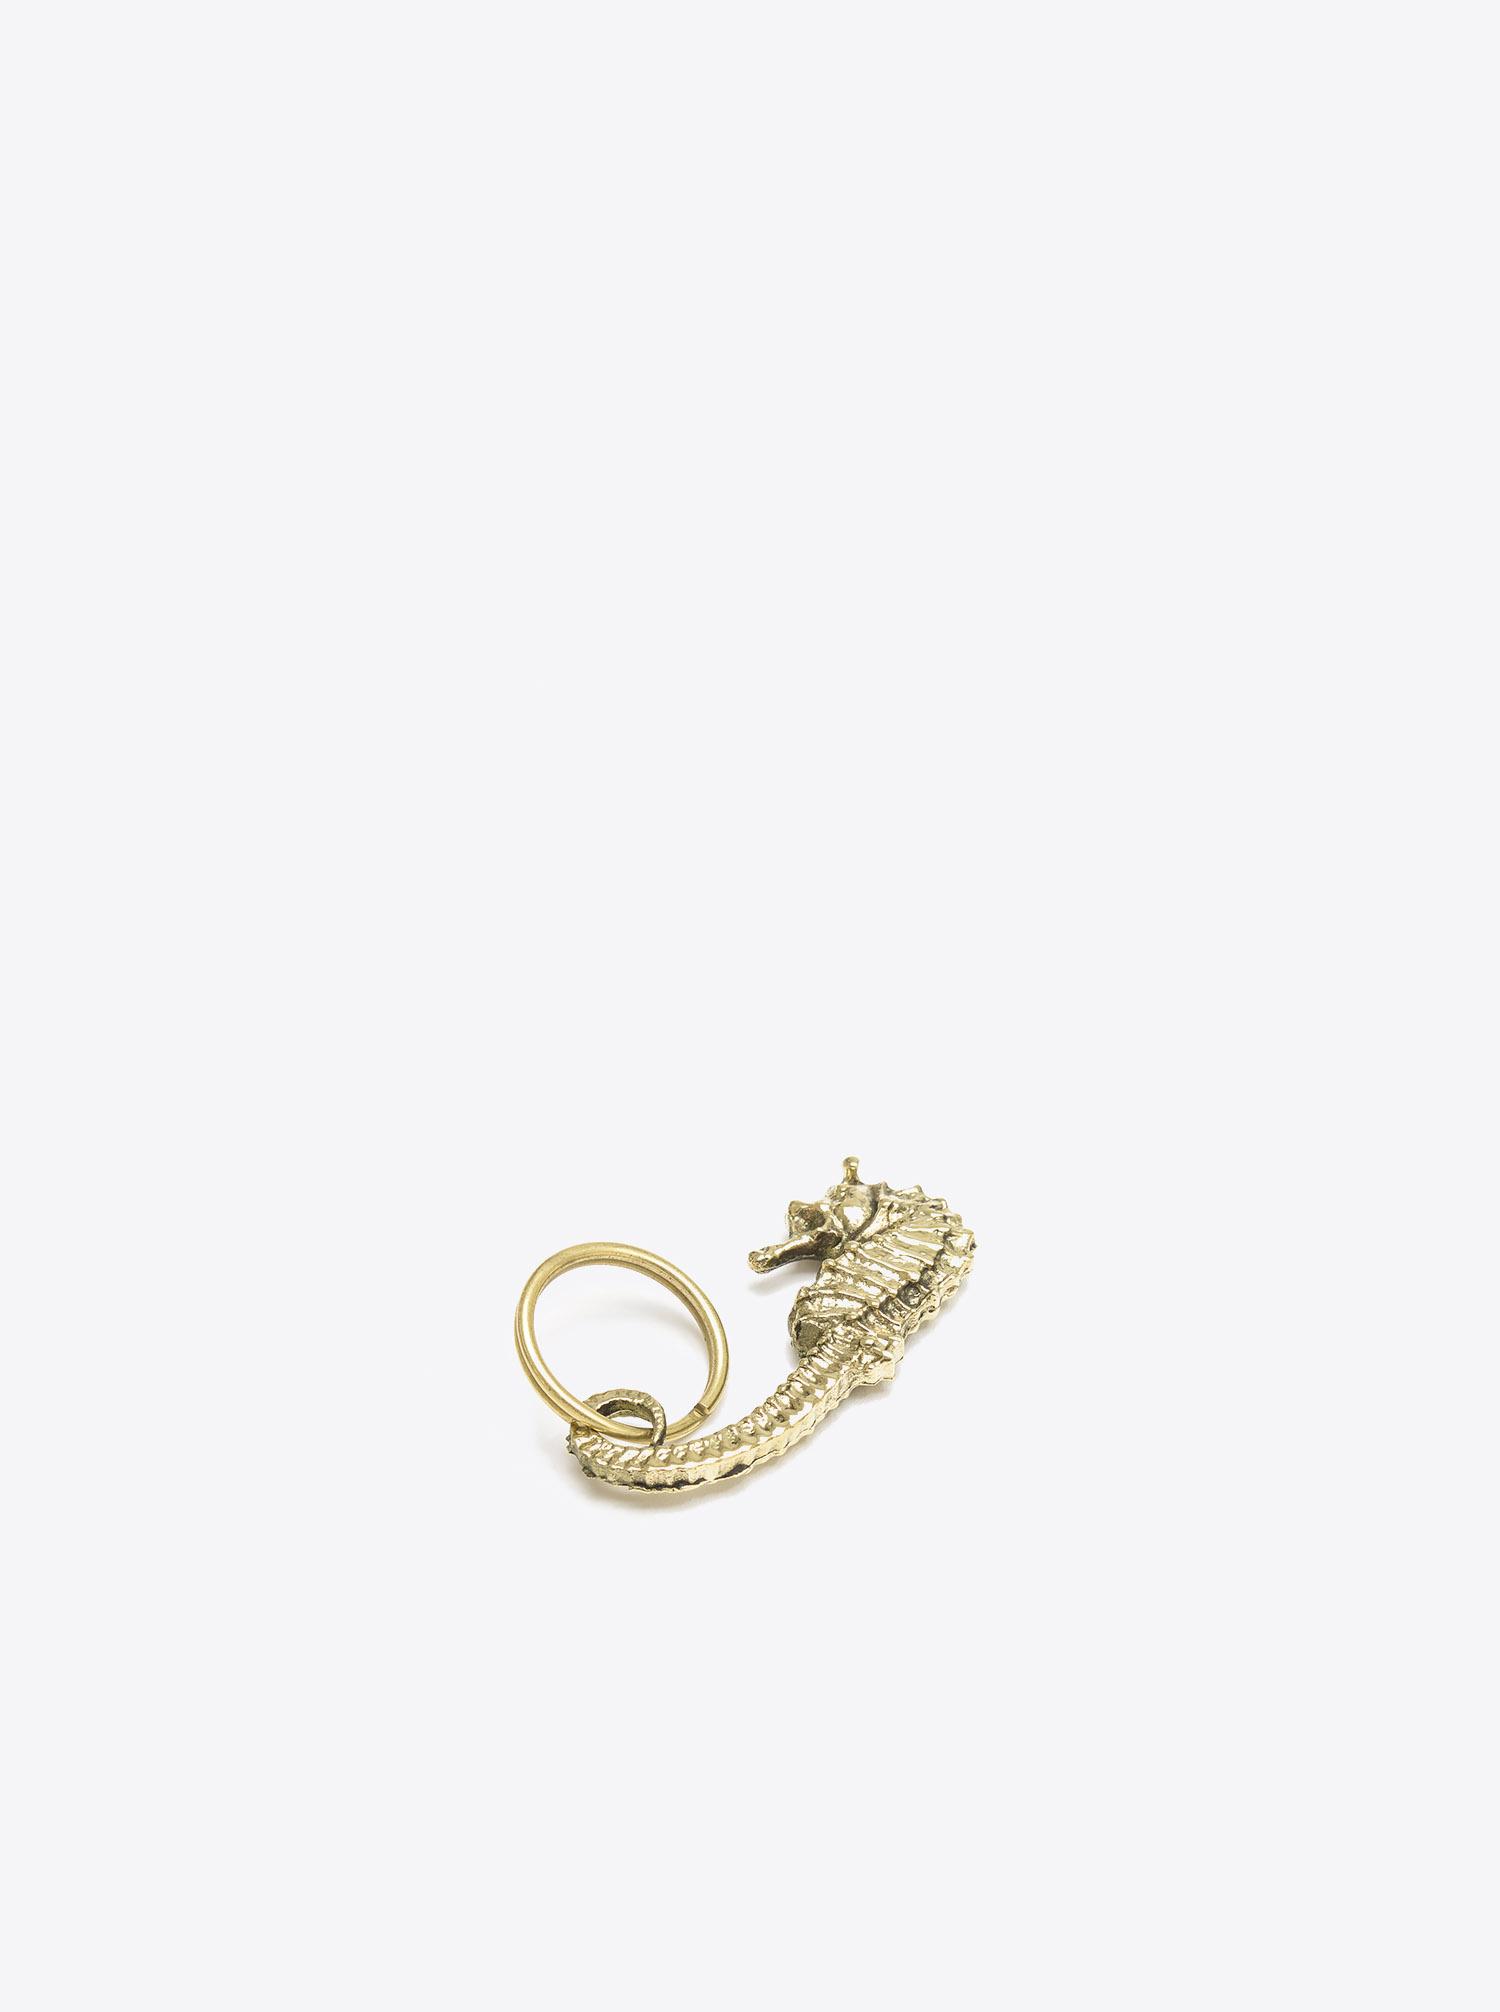 Schlüsselanhänger Seepferd Messing poliert